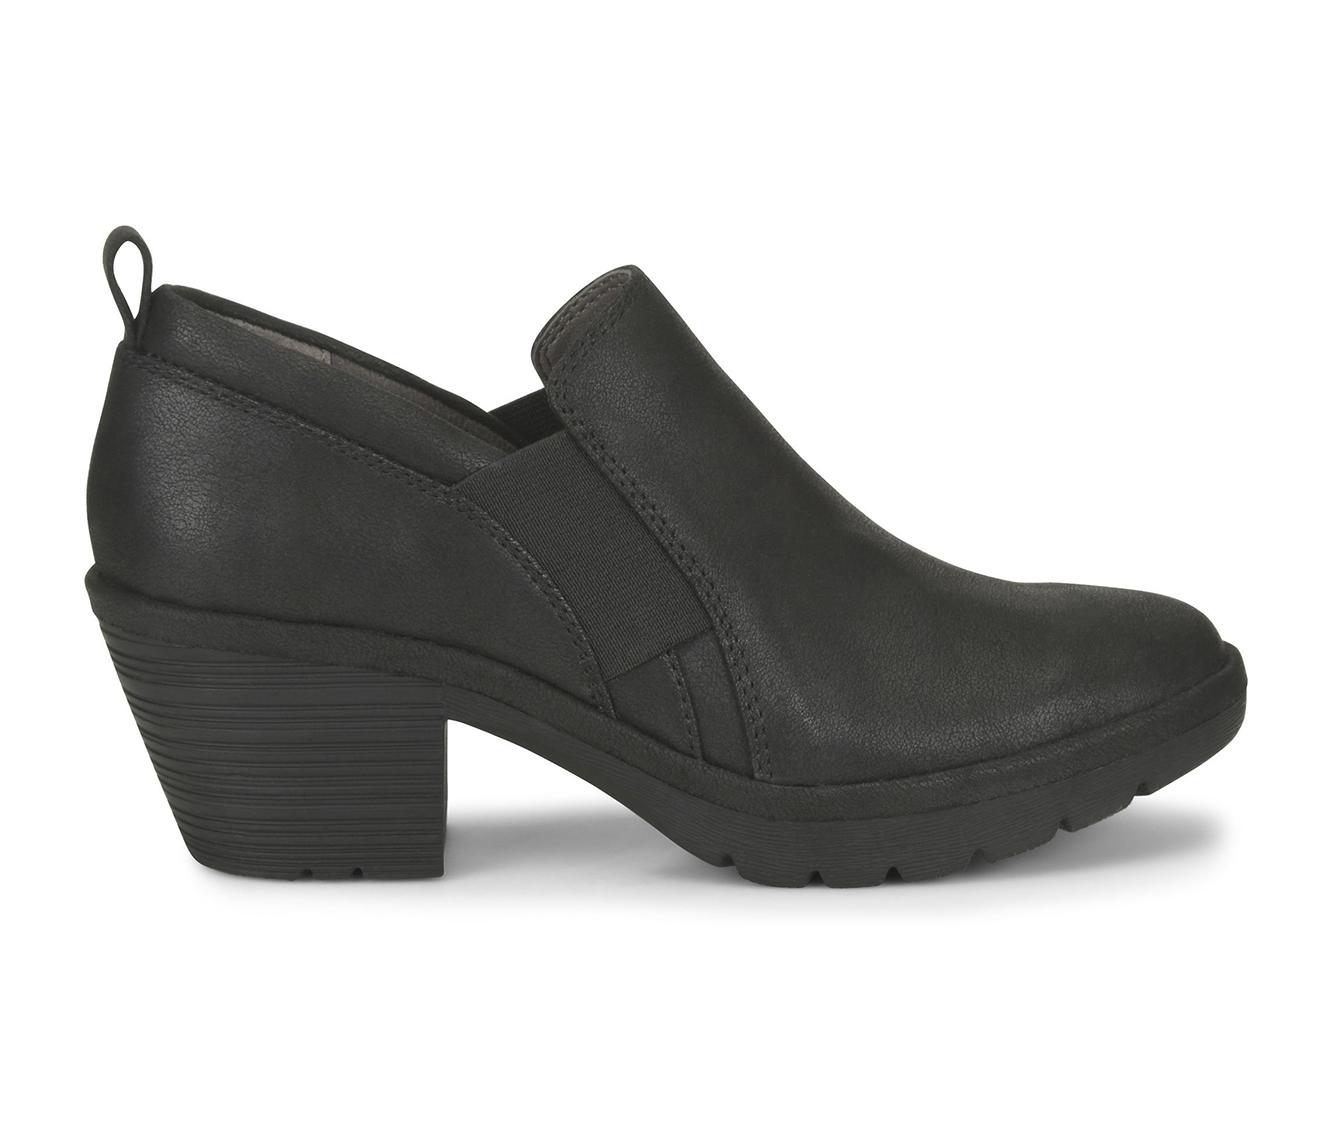 EuroSoft Temira Women's Shoe (Black Faux Leather)